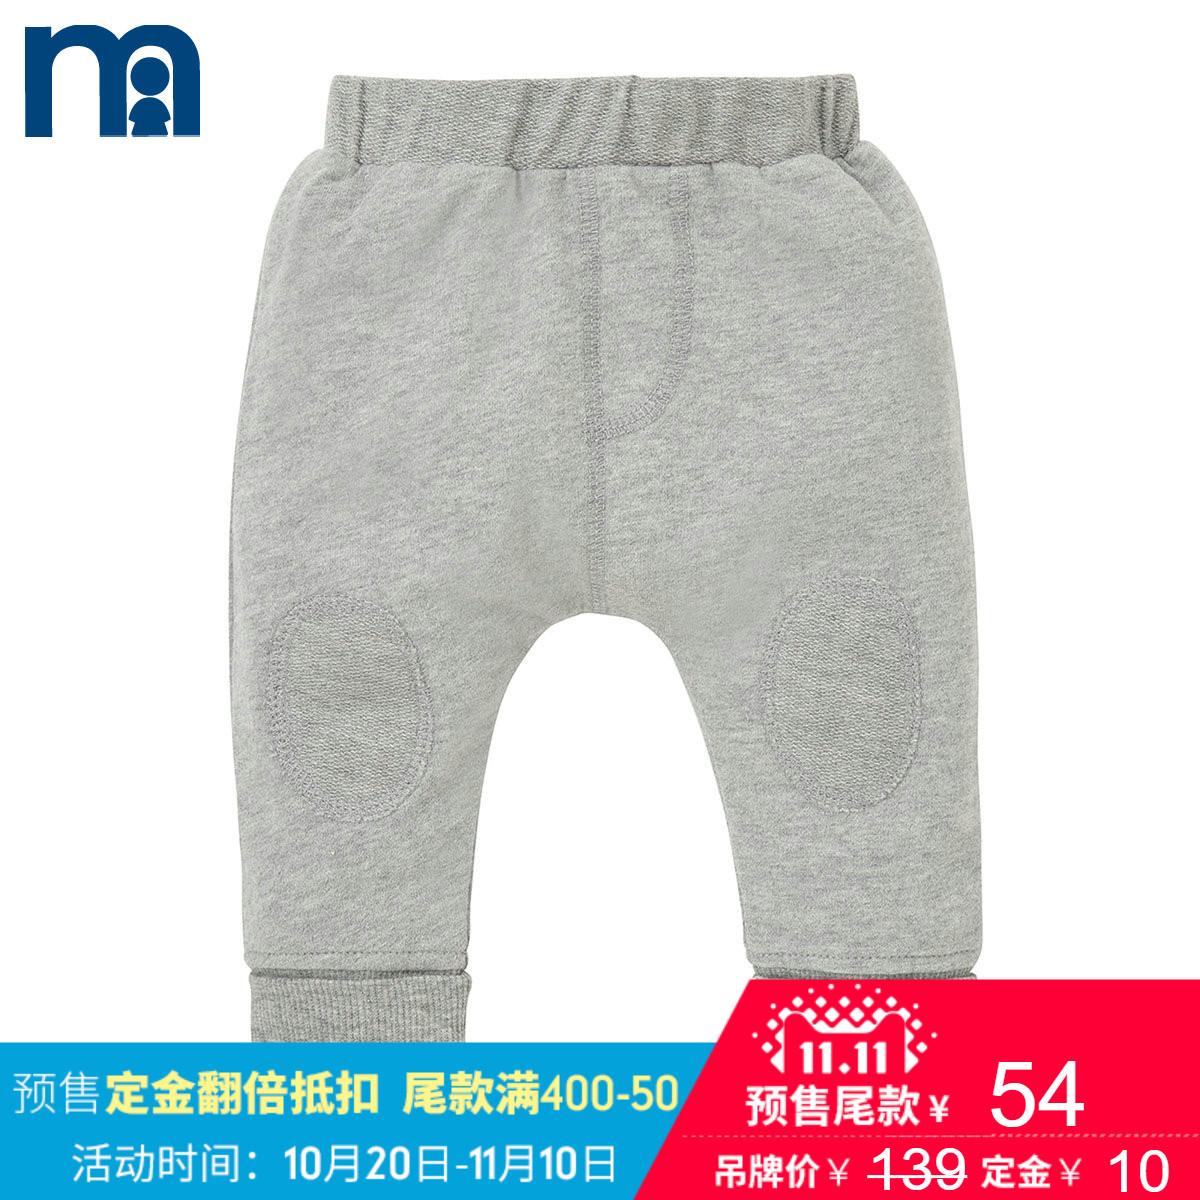 mothercare英国 新生儿休闲裤男女婴儿裤子 宝宝棉质长裤 1-3周岁